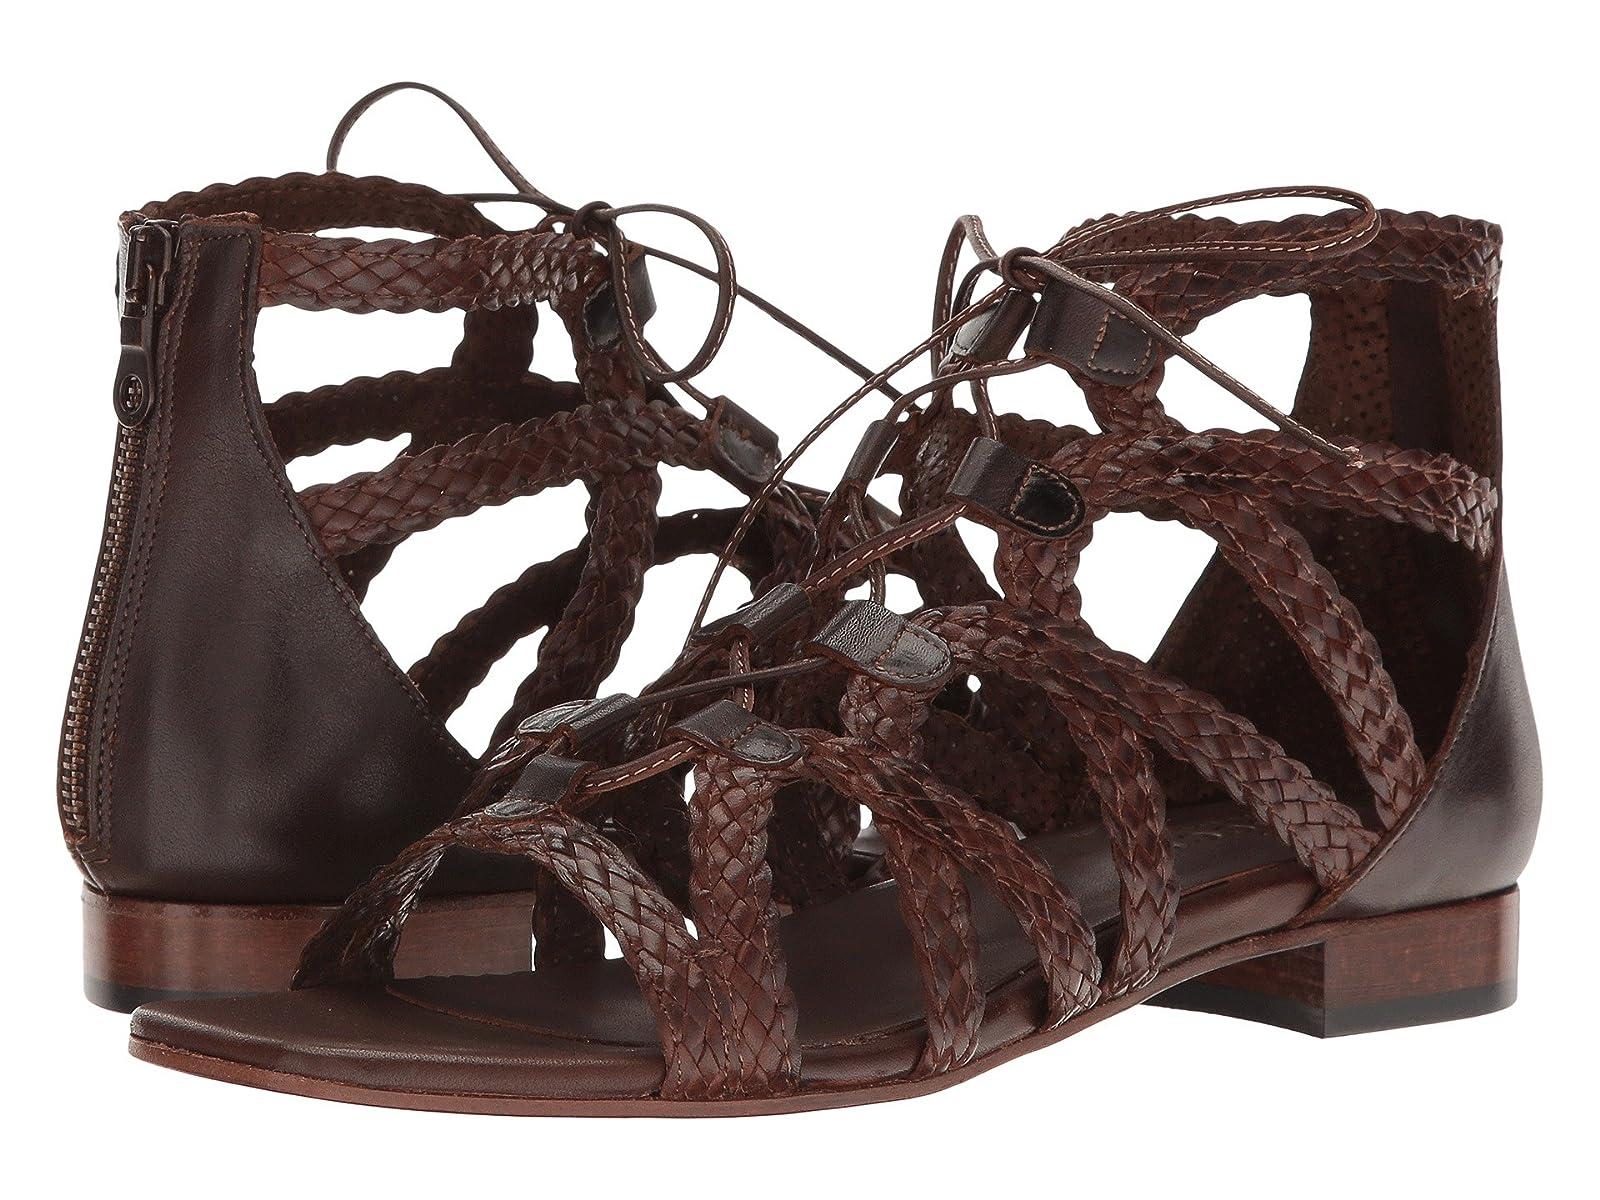 Sesto Meucci GalilaCheap and distinctive eye-catching shoes